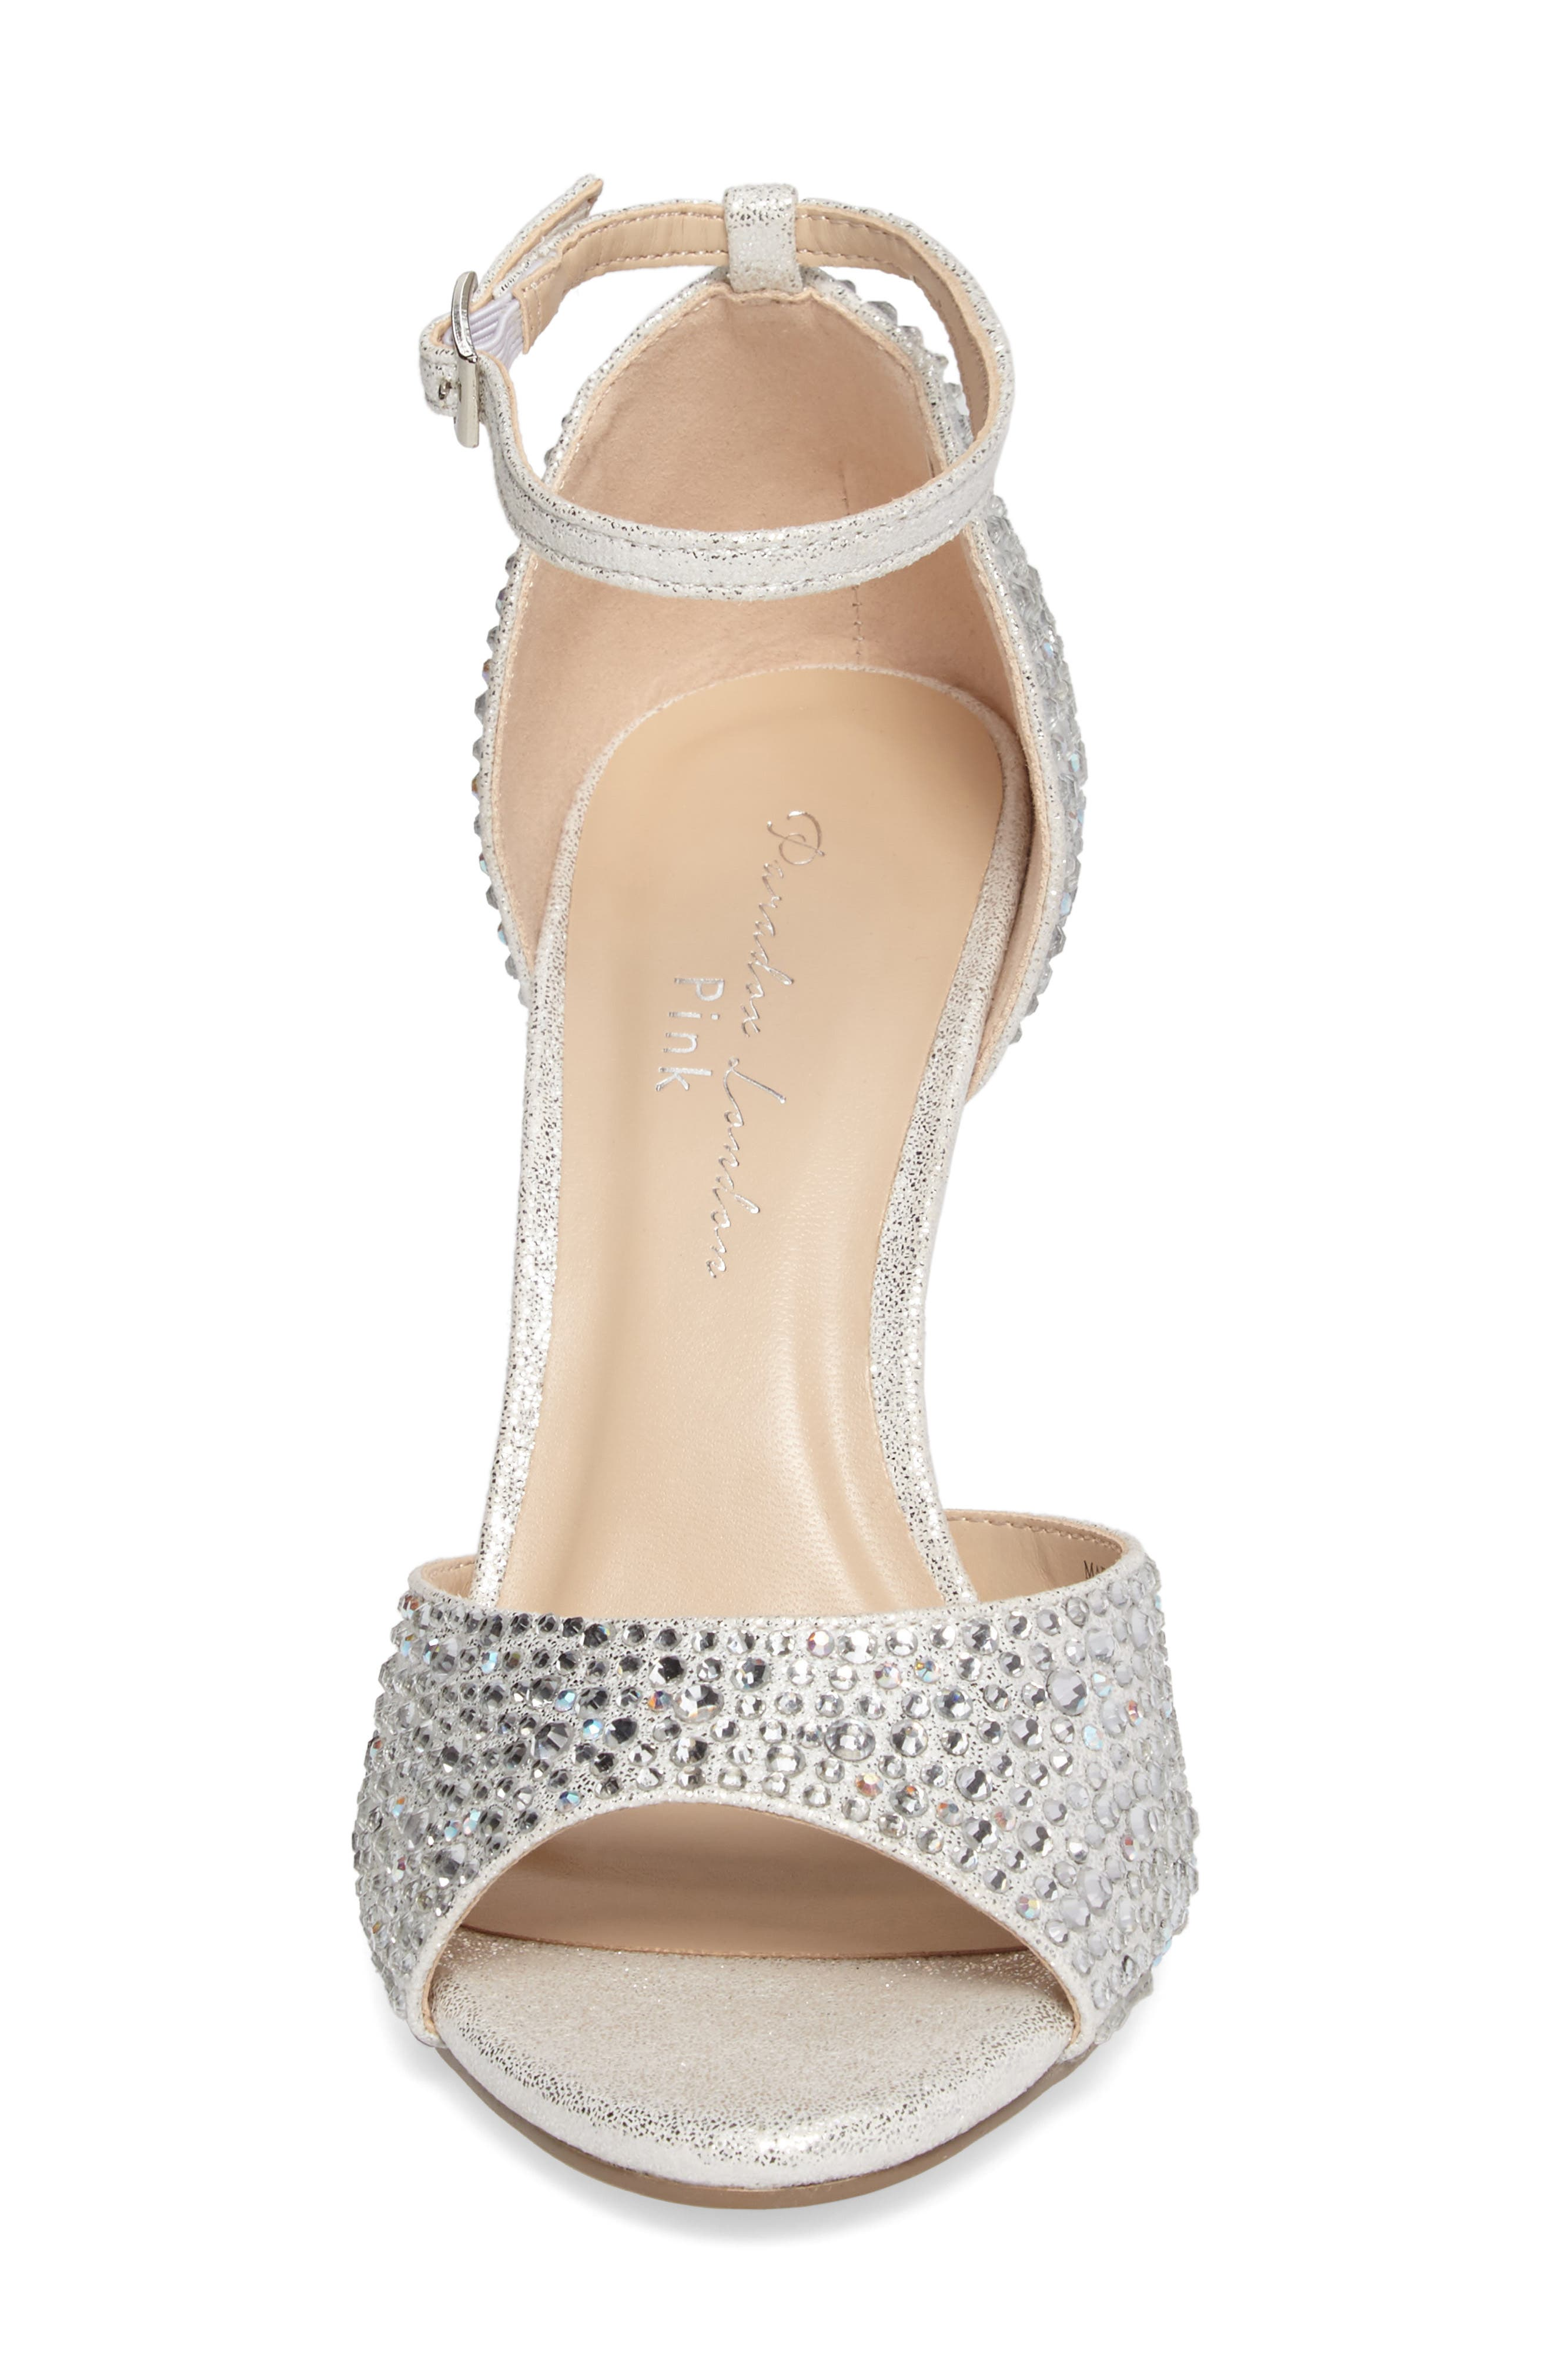 Mira Embellished Glitter Sandal,                             Alternate thumbnail 4, color,                             Silver